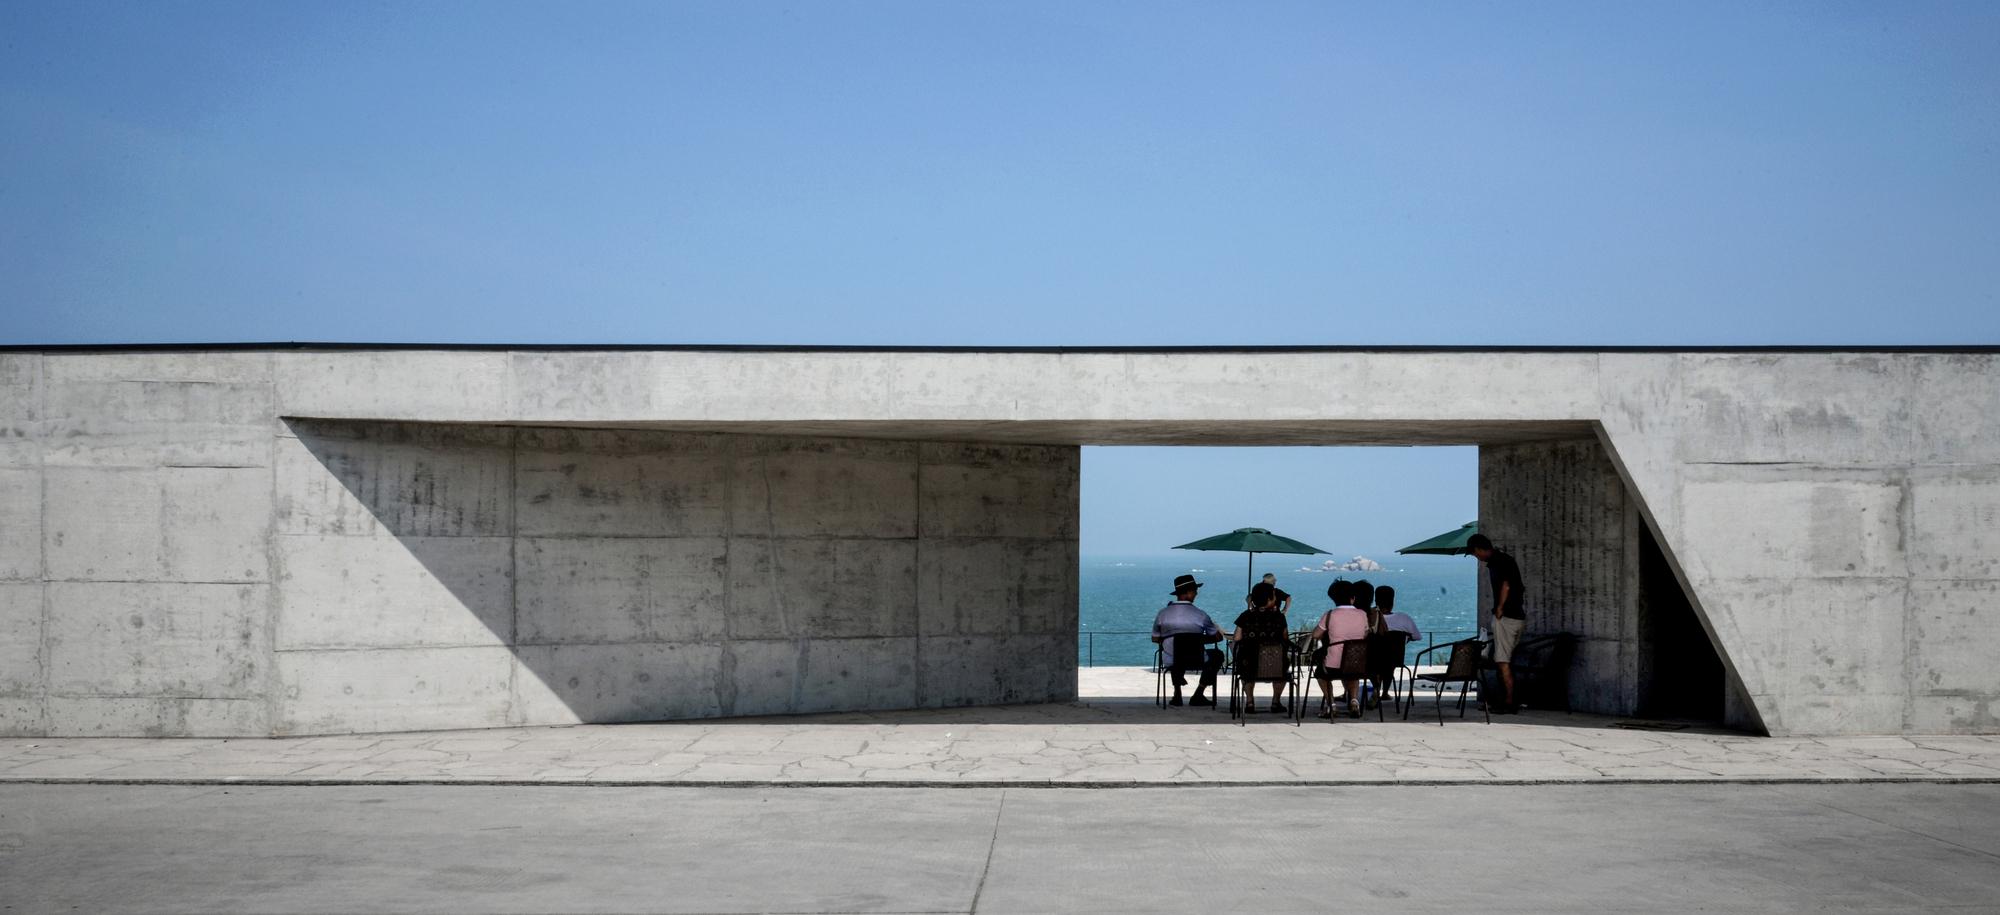 Abstract Gallery / Yin Peiru Architecture Studio